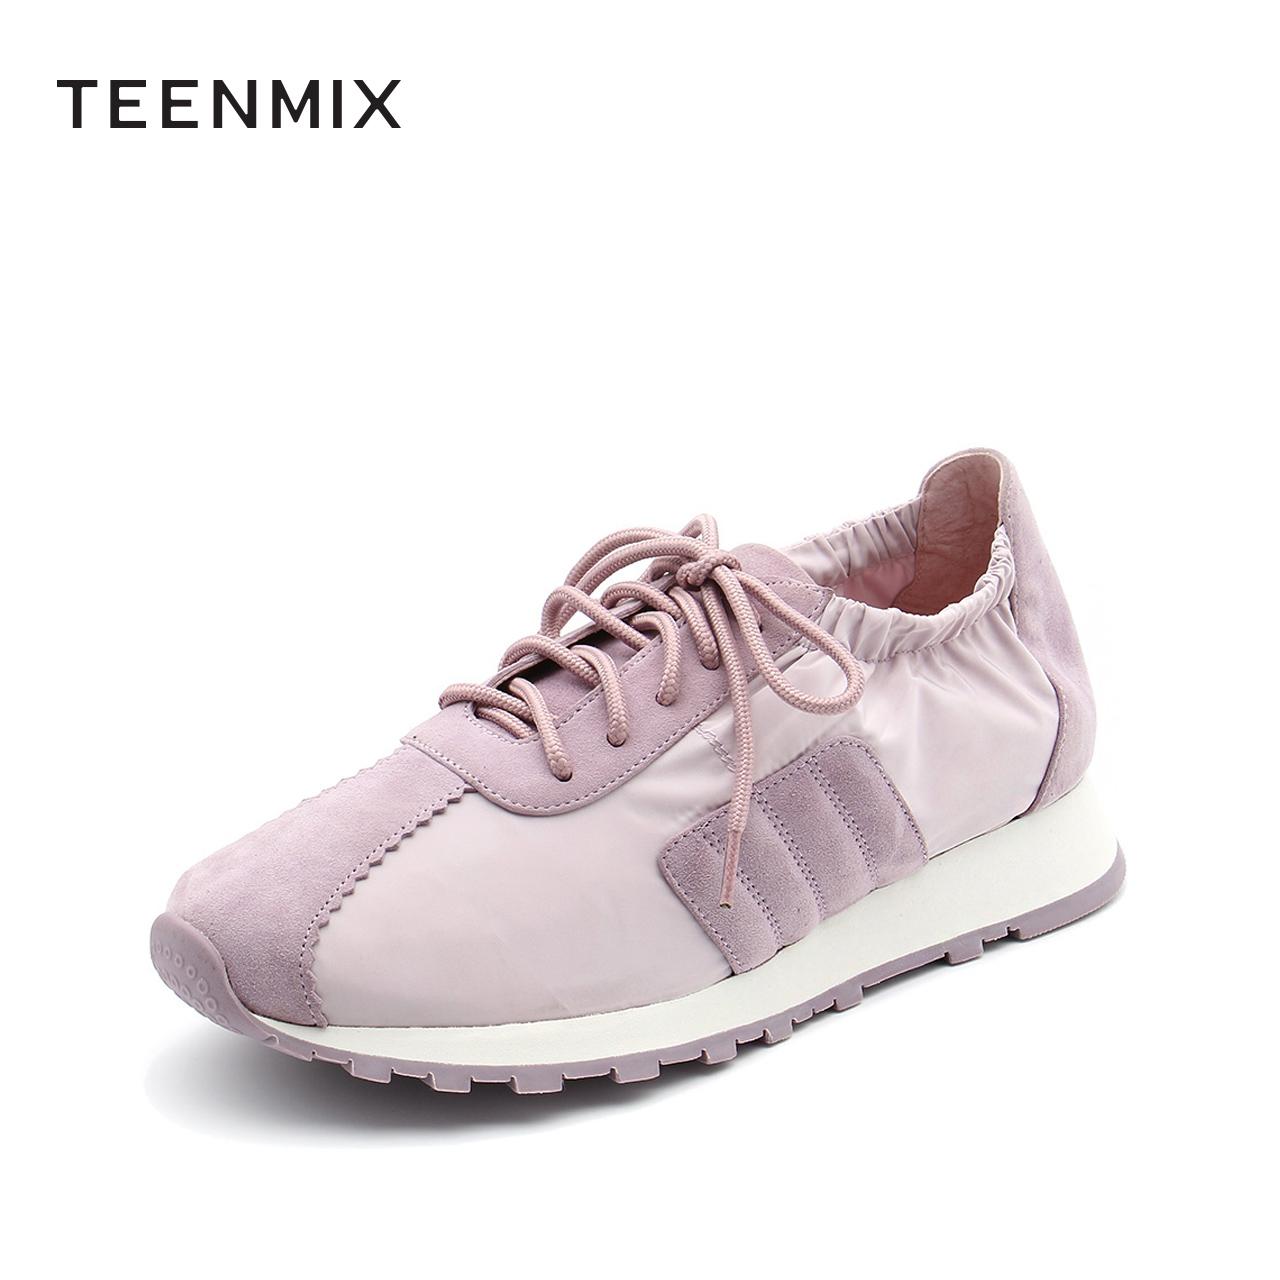 CIE25AM9 春新款 2019 天美意商场同款运动系带休闲鞋女 淘宝预售